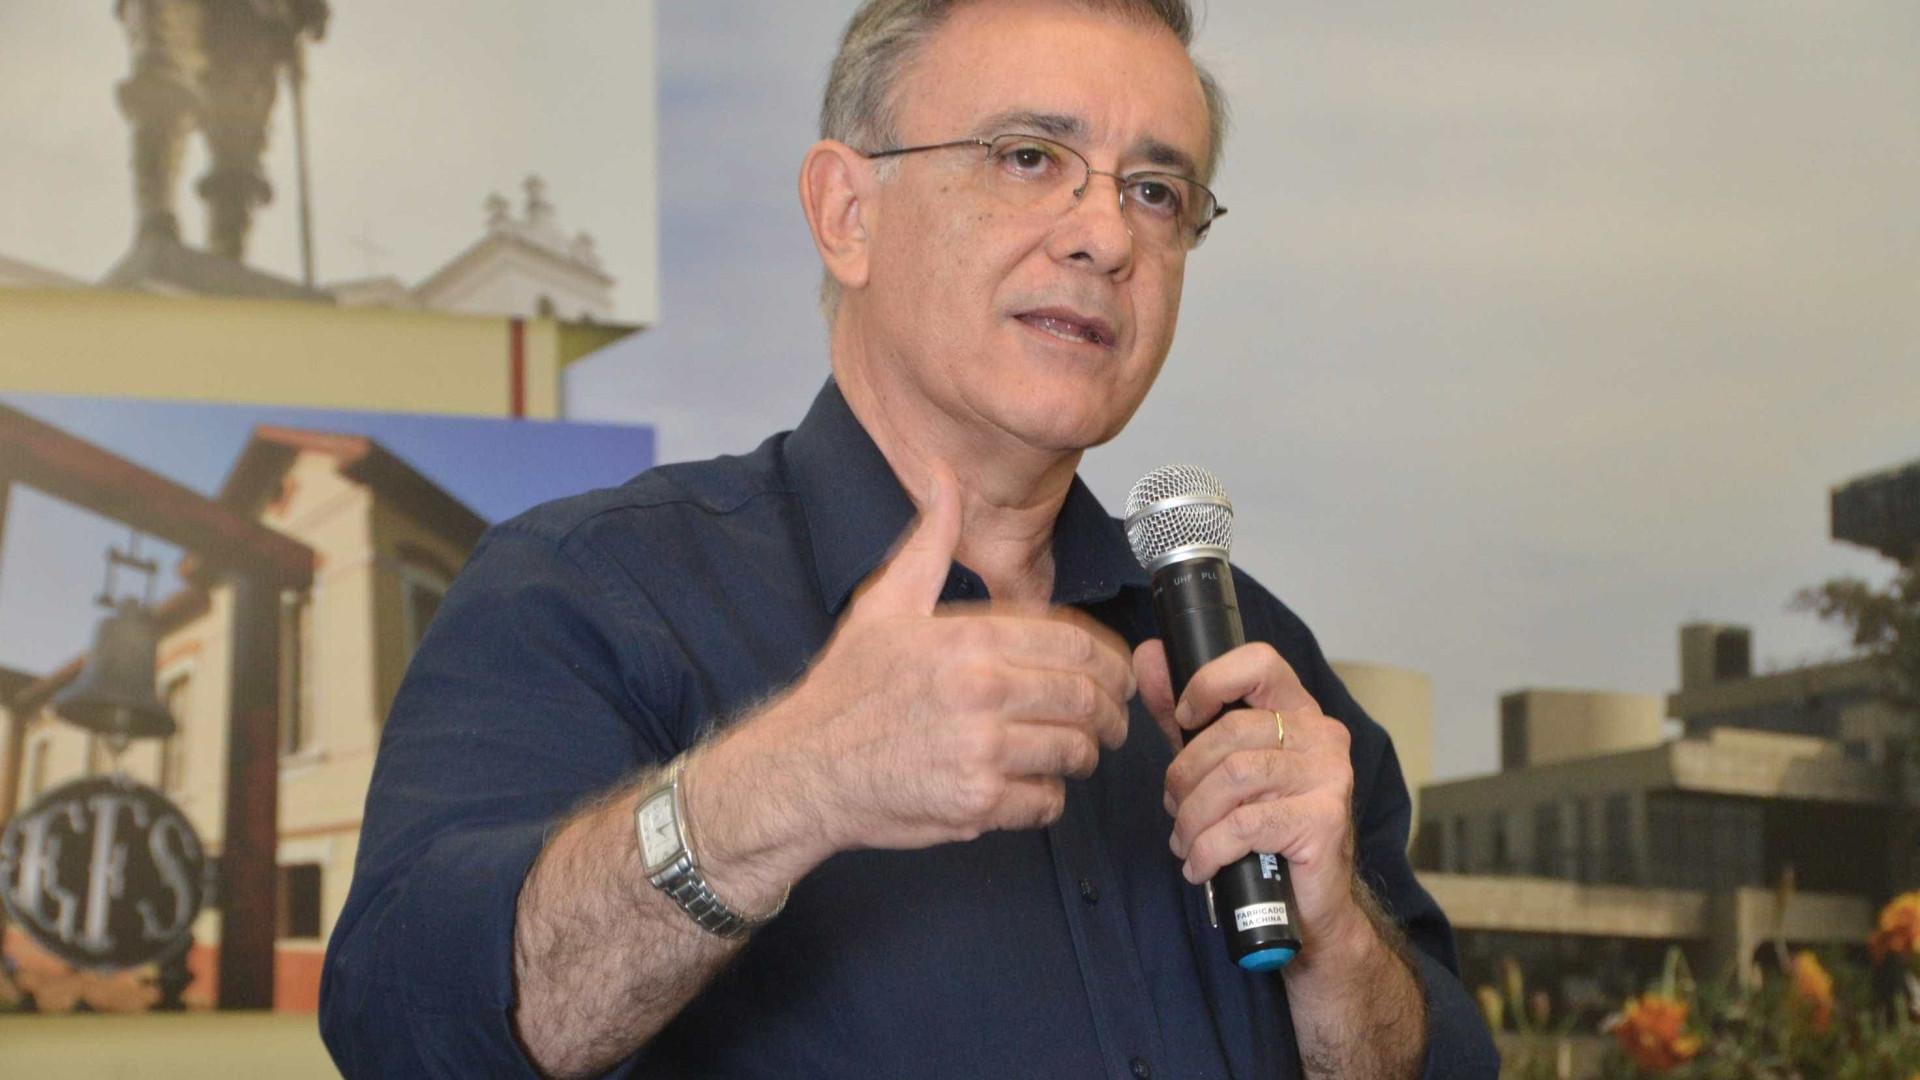 Câmara de Vereadores cassa mandato do prefeito de Sorocaba